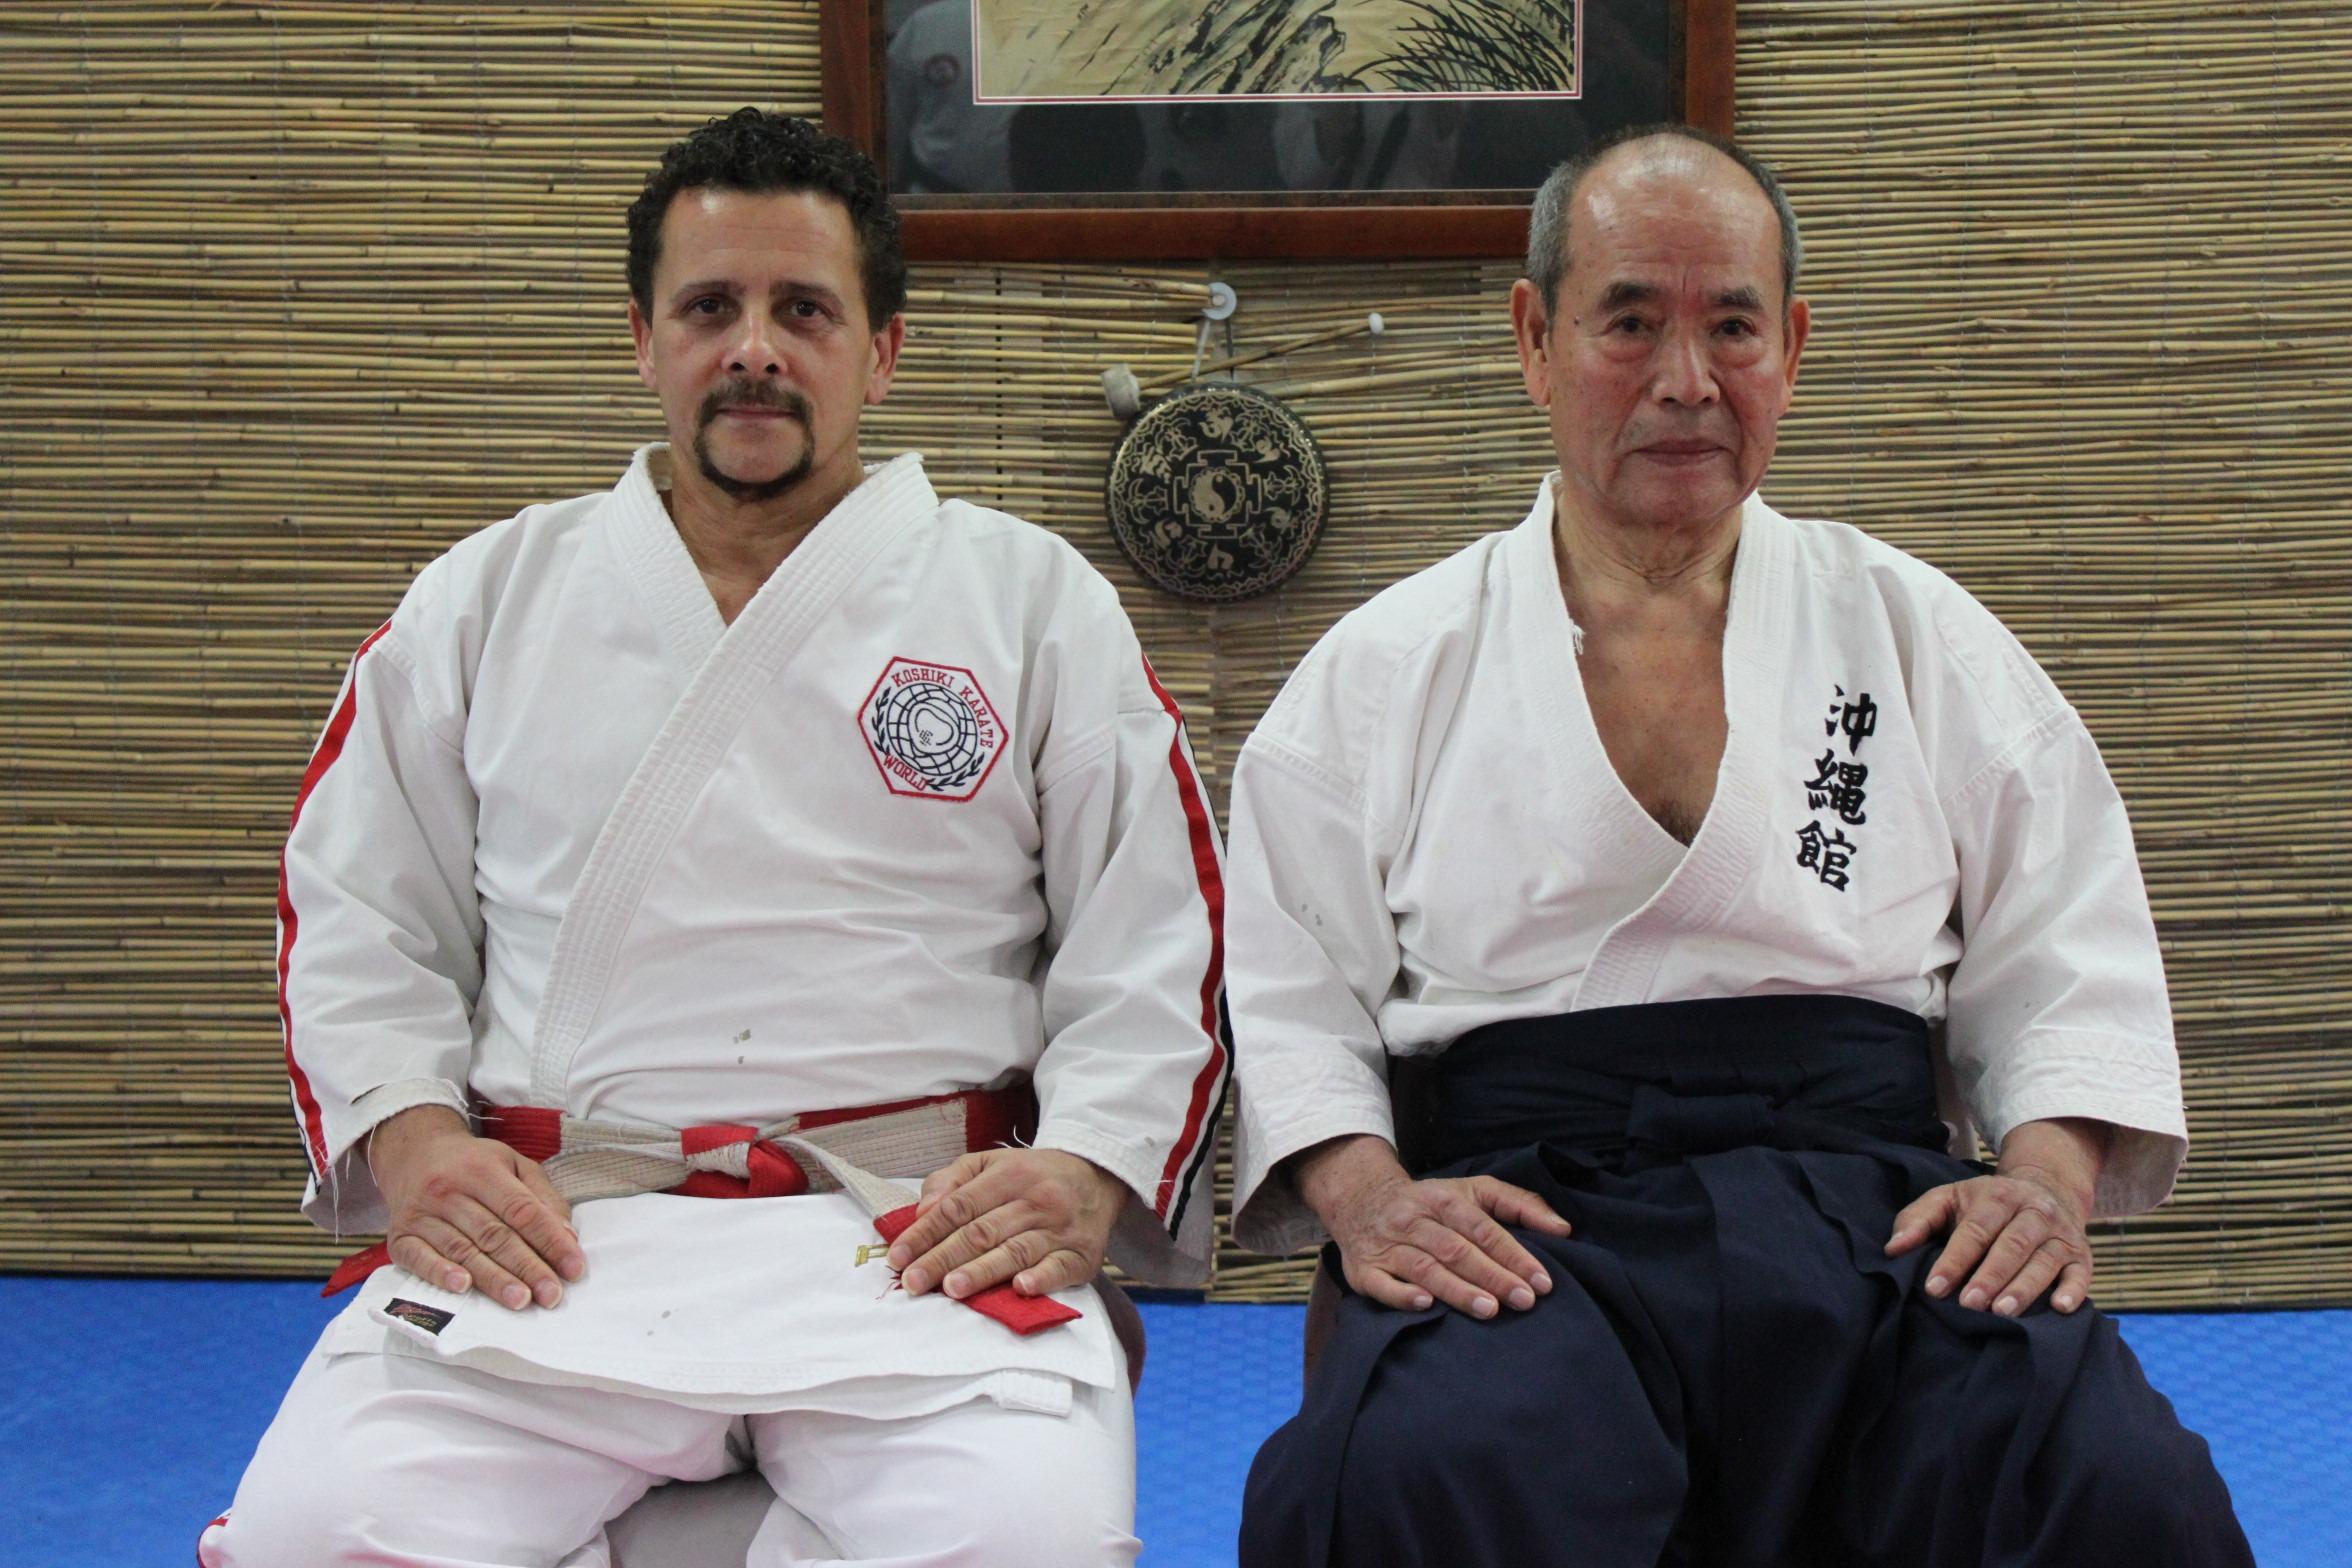 Ian and Kiichi